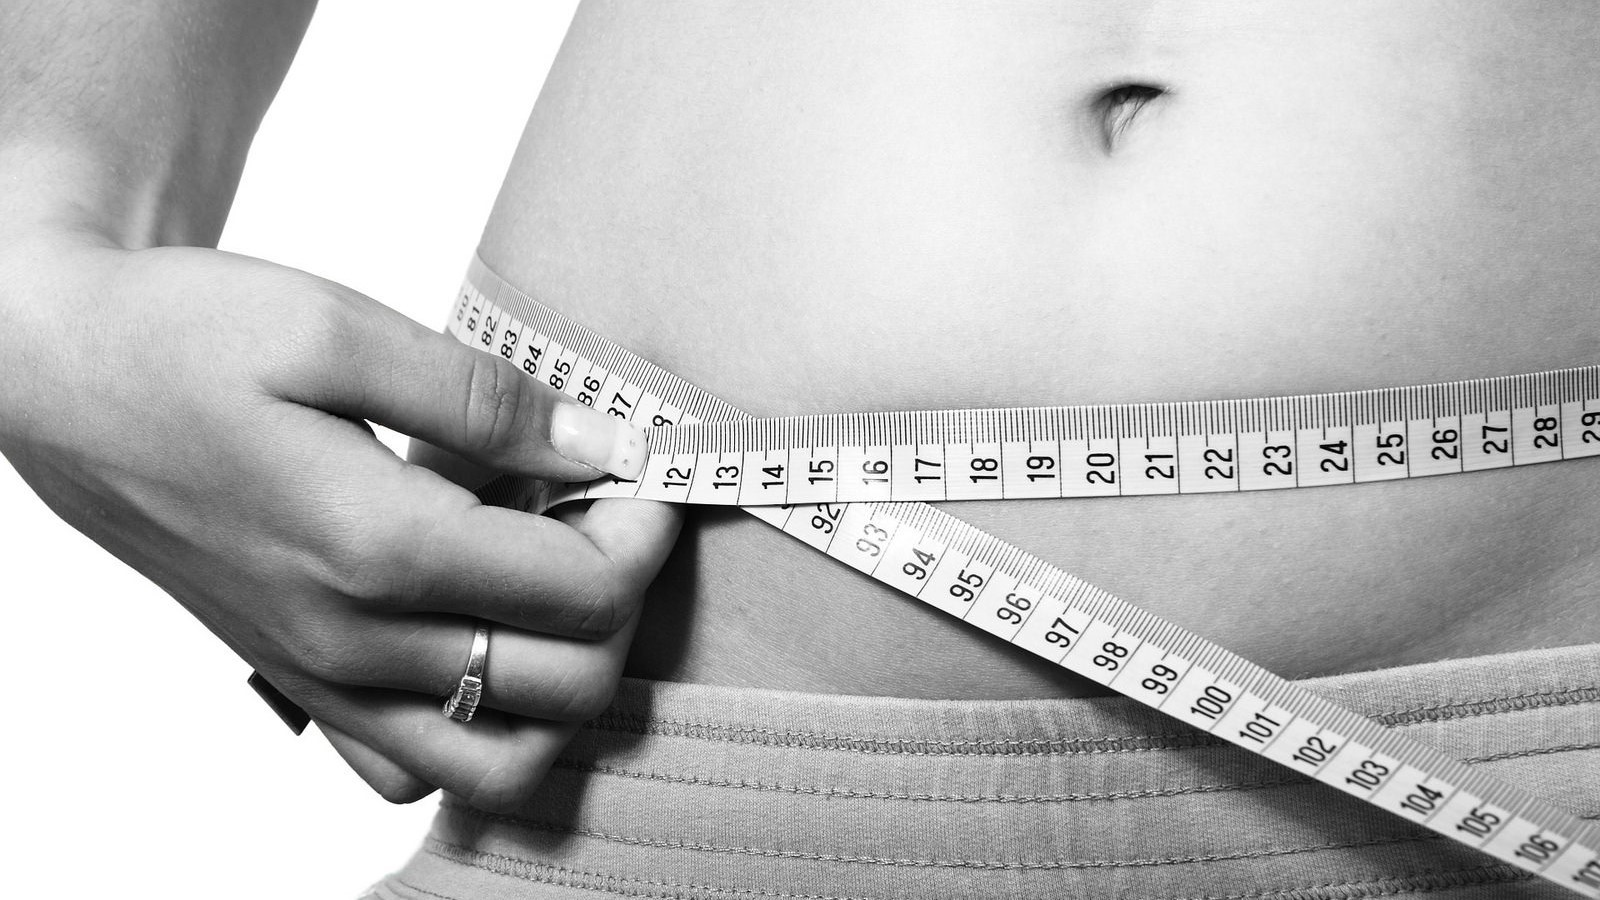 negrul gras pierde in greutate)